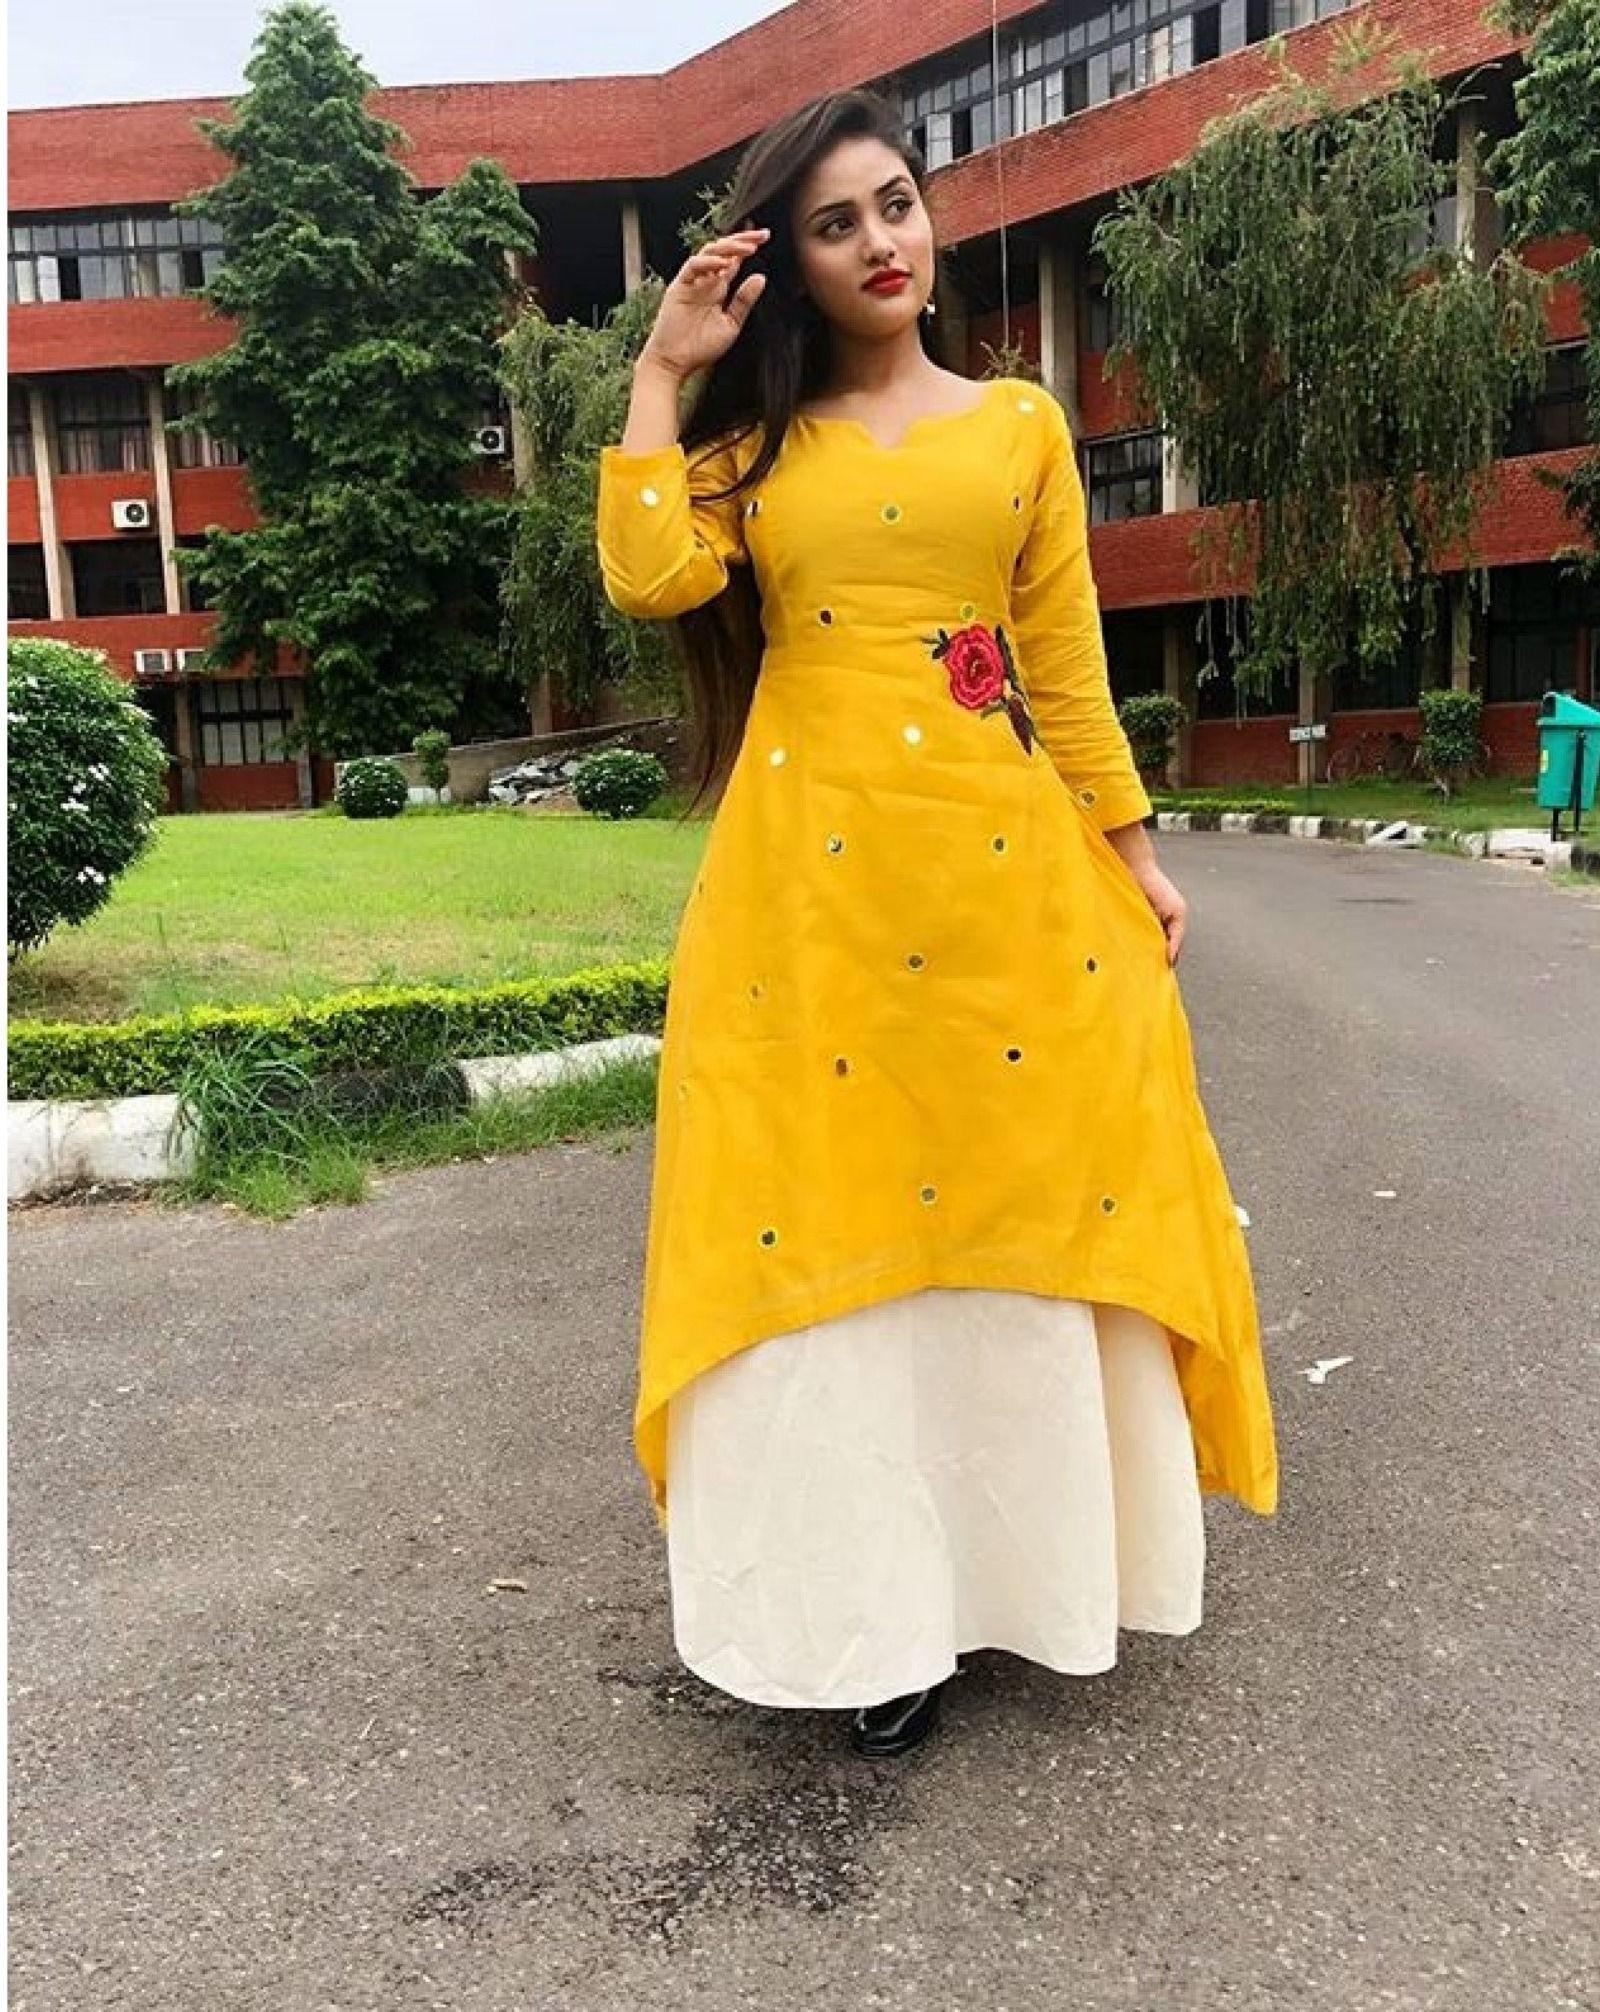 Pure Rayon Skirt Rose Mirror Print Kurti Yellow White Rose Print Skirt Rayon Skirt Kurti Designs Party Wear